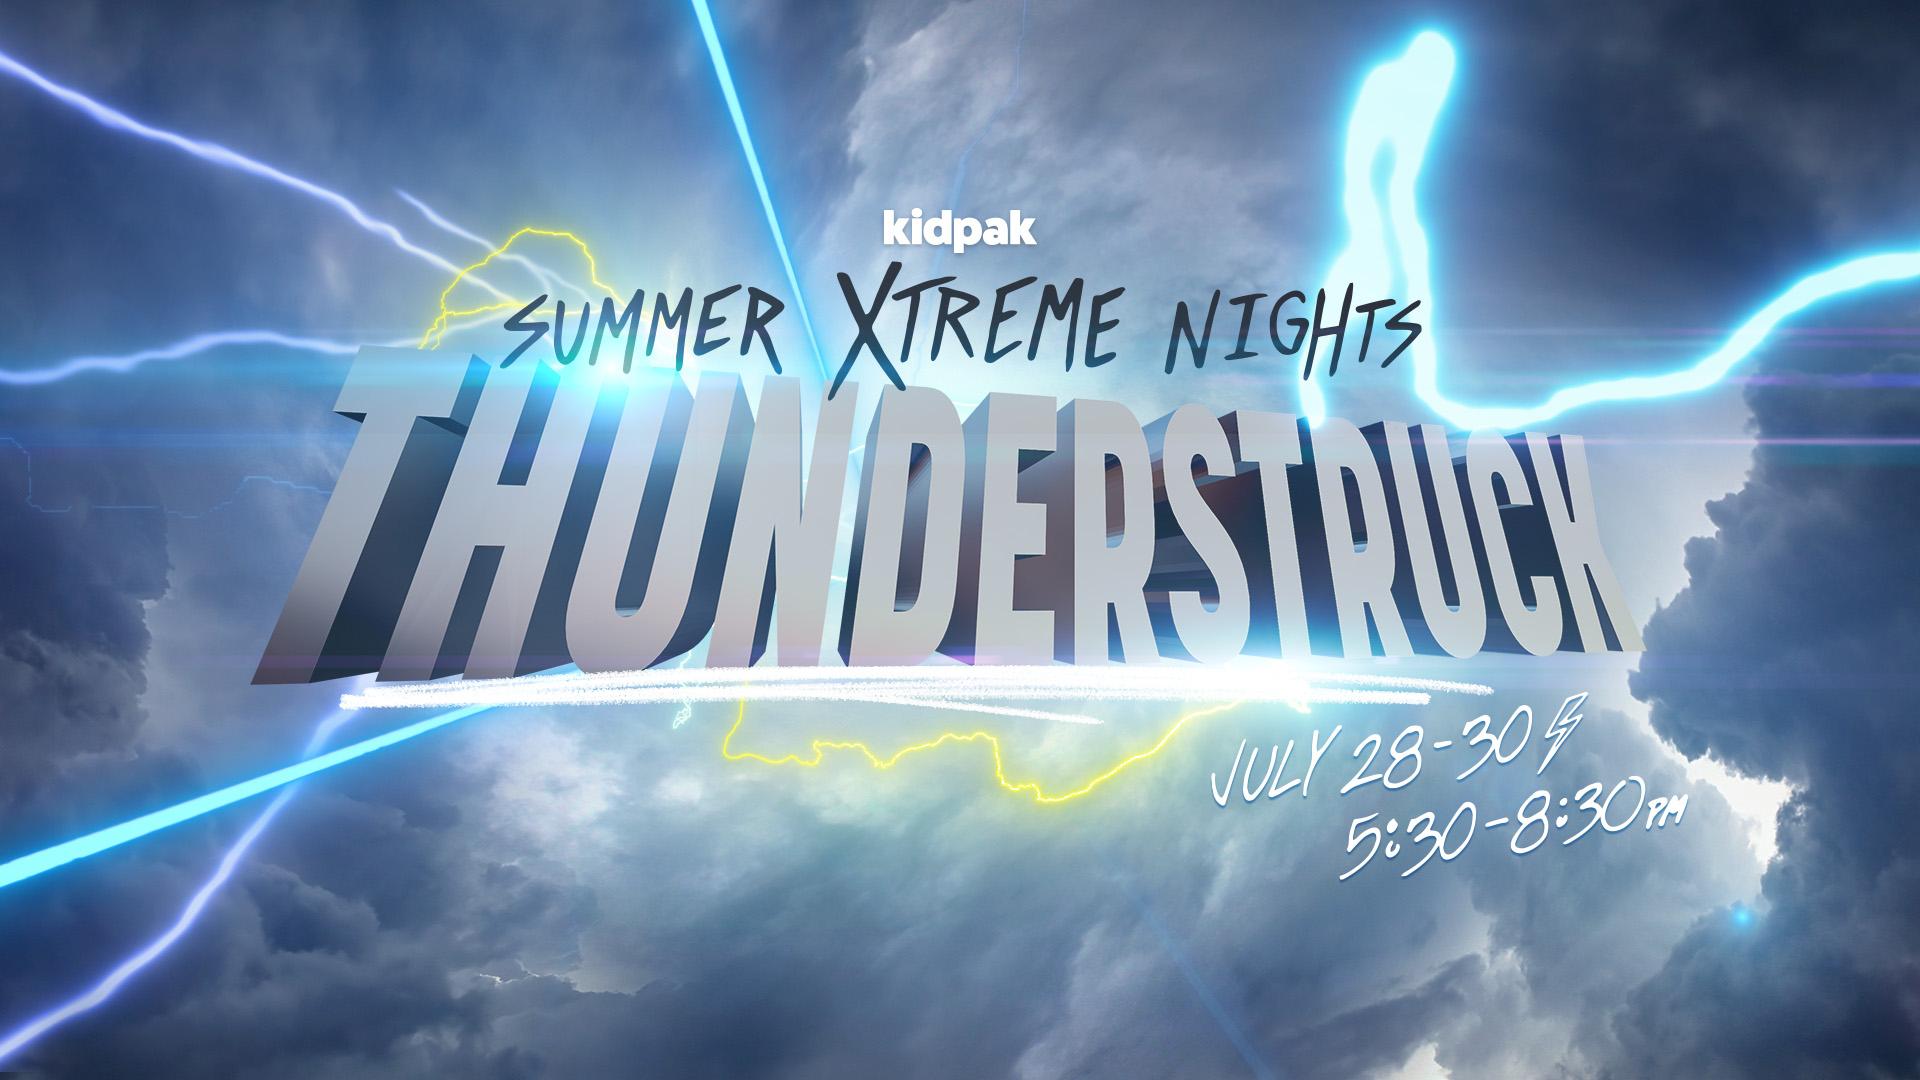 Summer Xtreme Nights Gwinnett at the Gwinnett campus